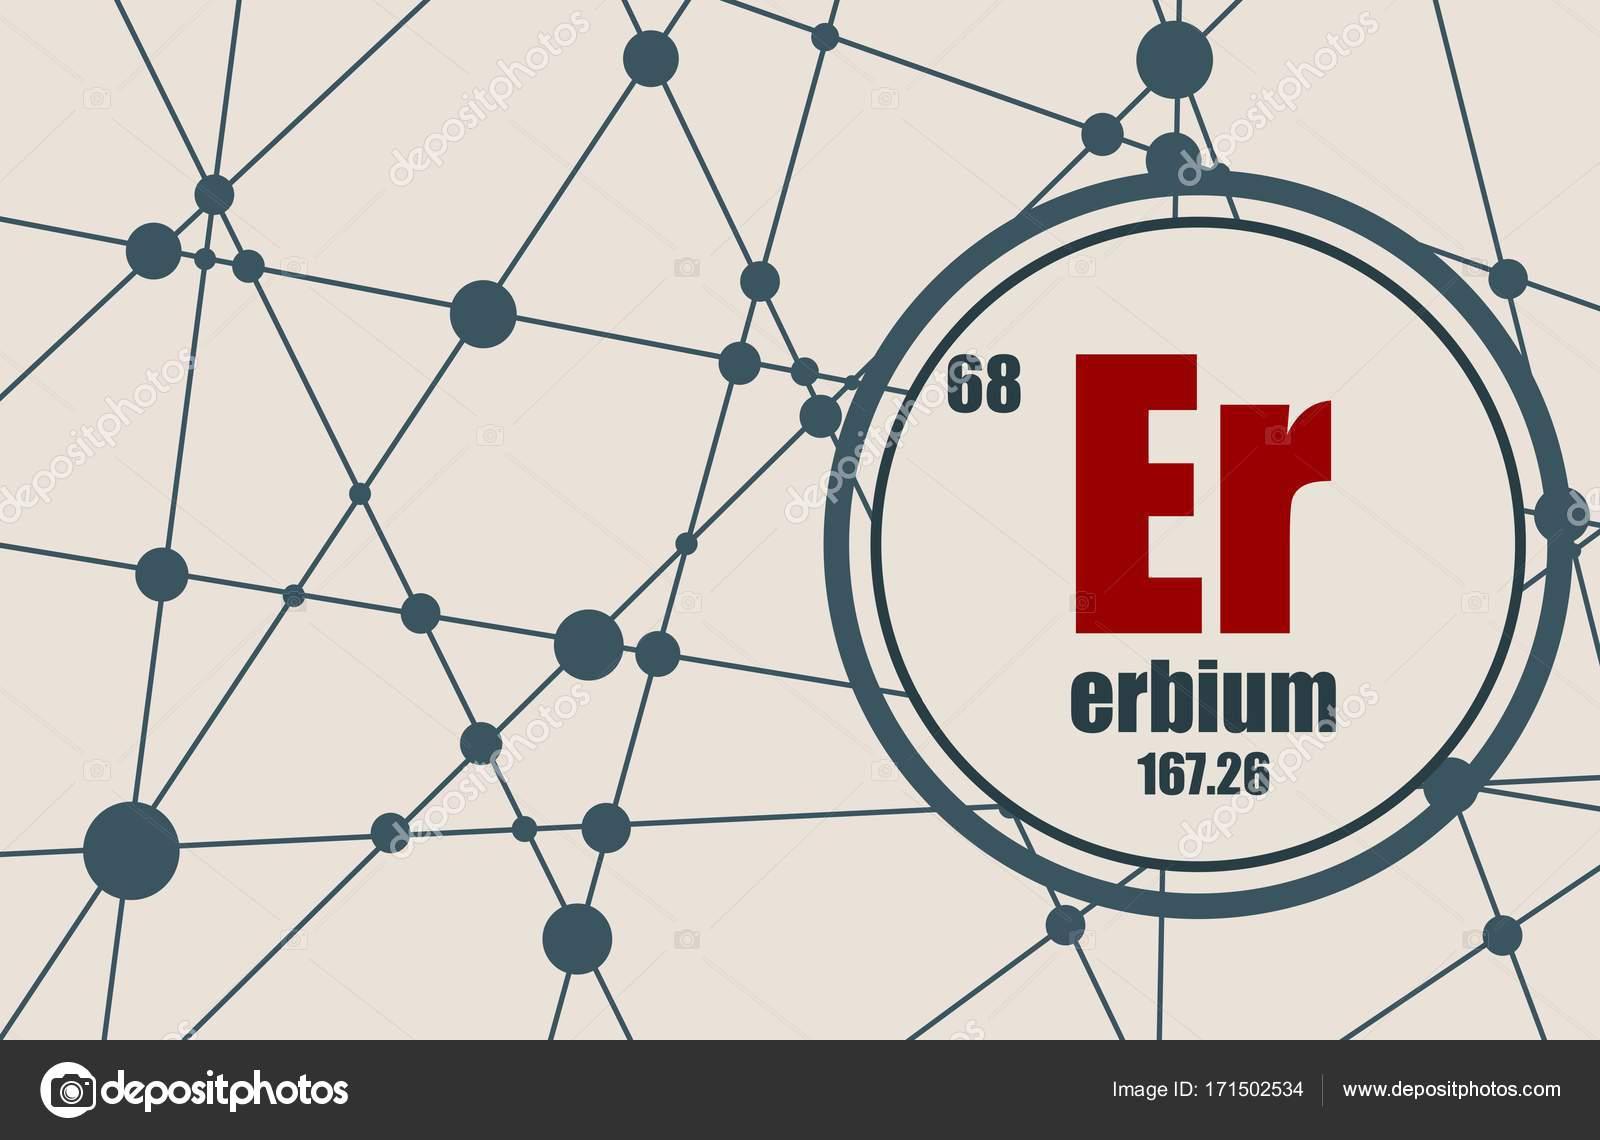 Erbium Chemical Element Stock Vector Jegasra 171502534